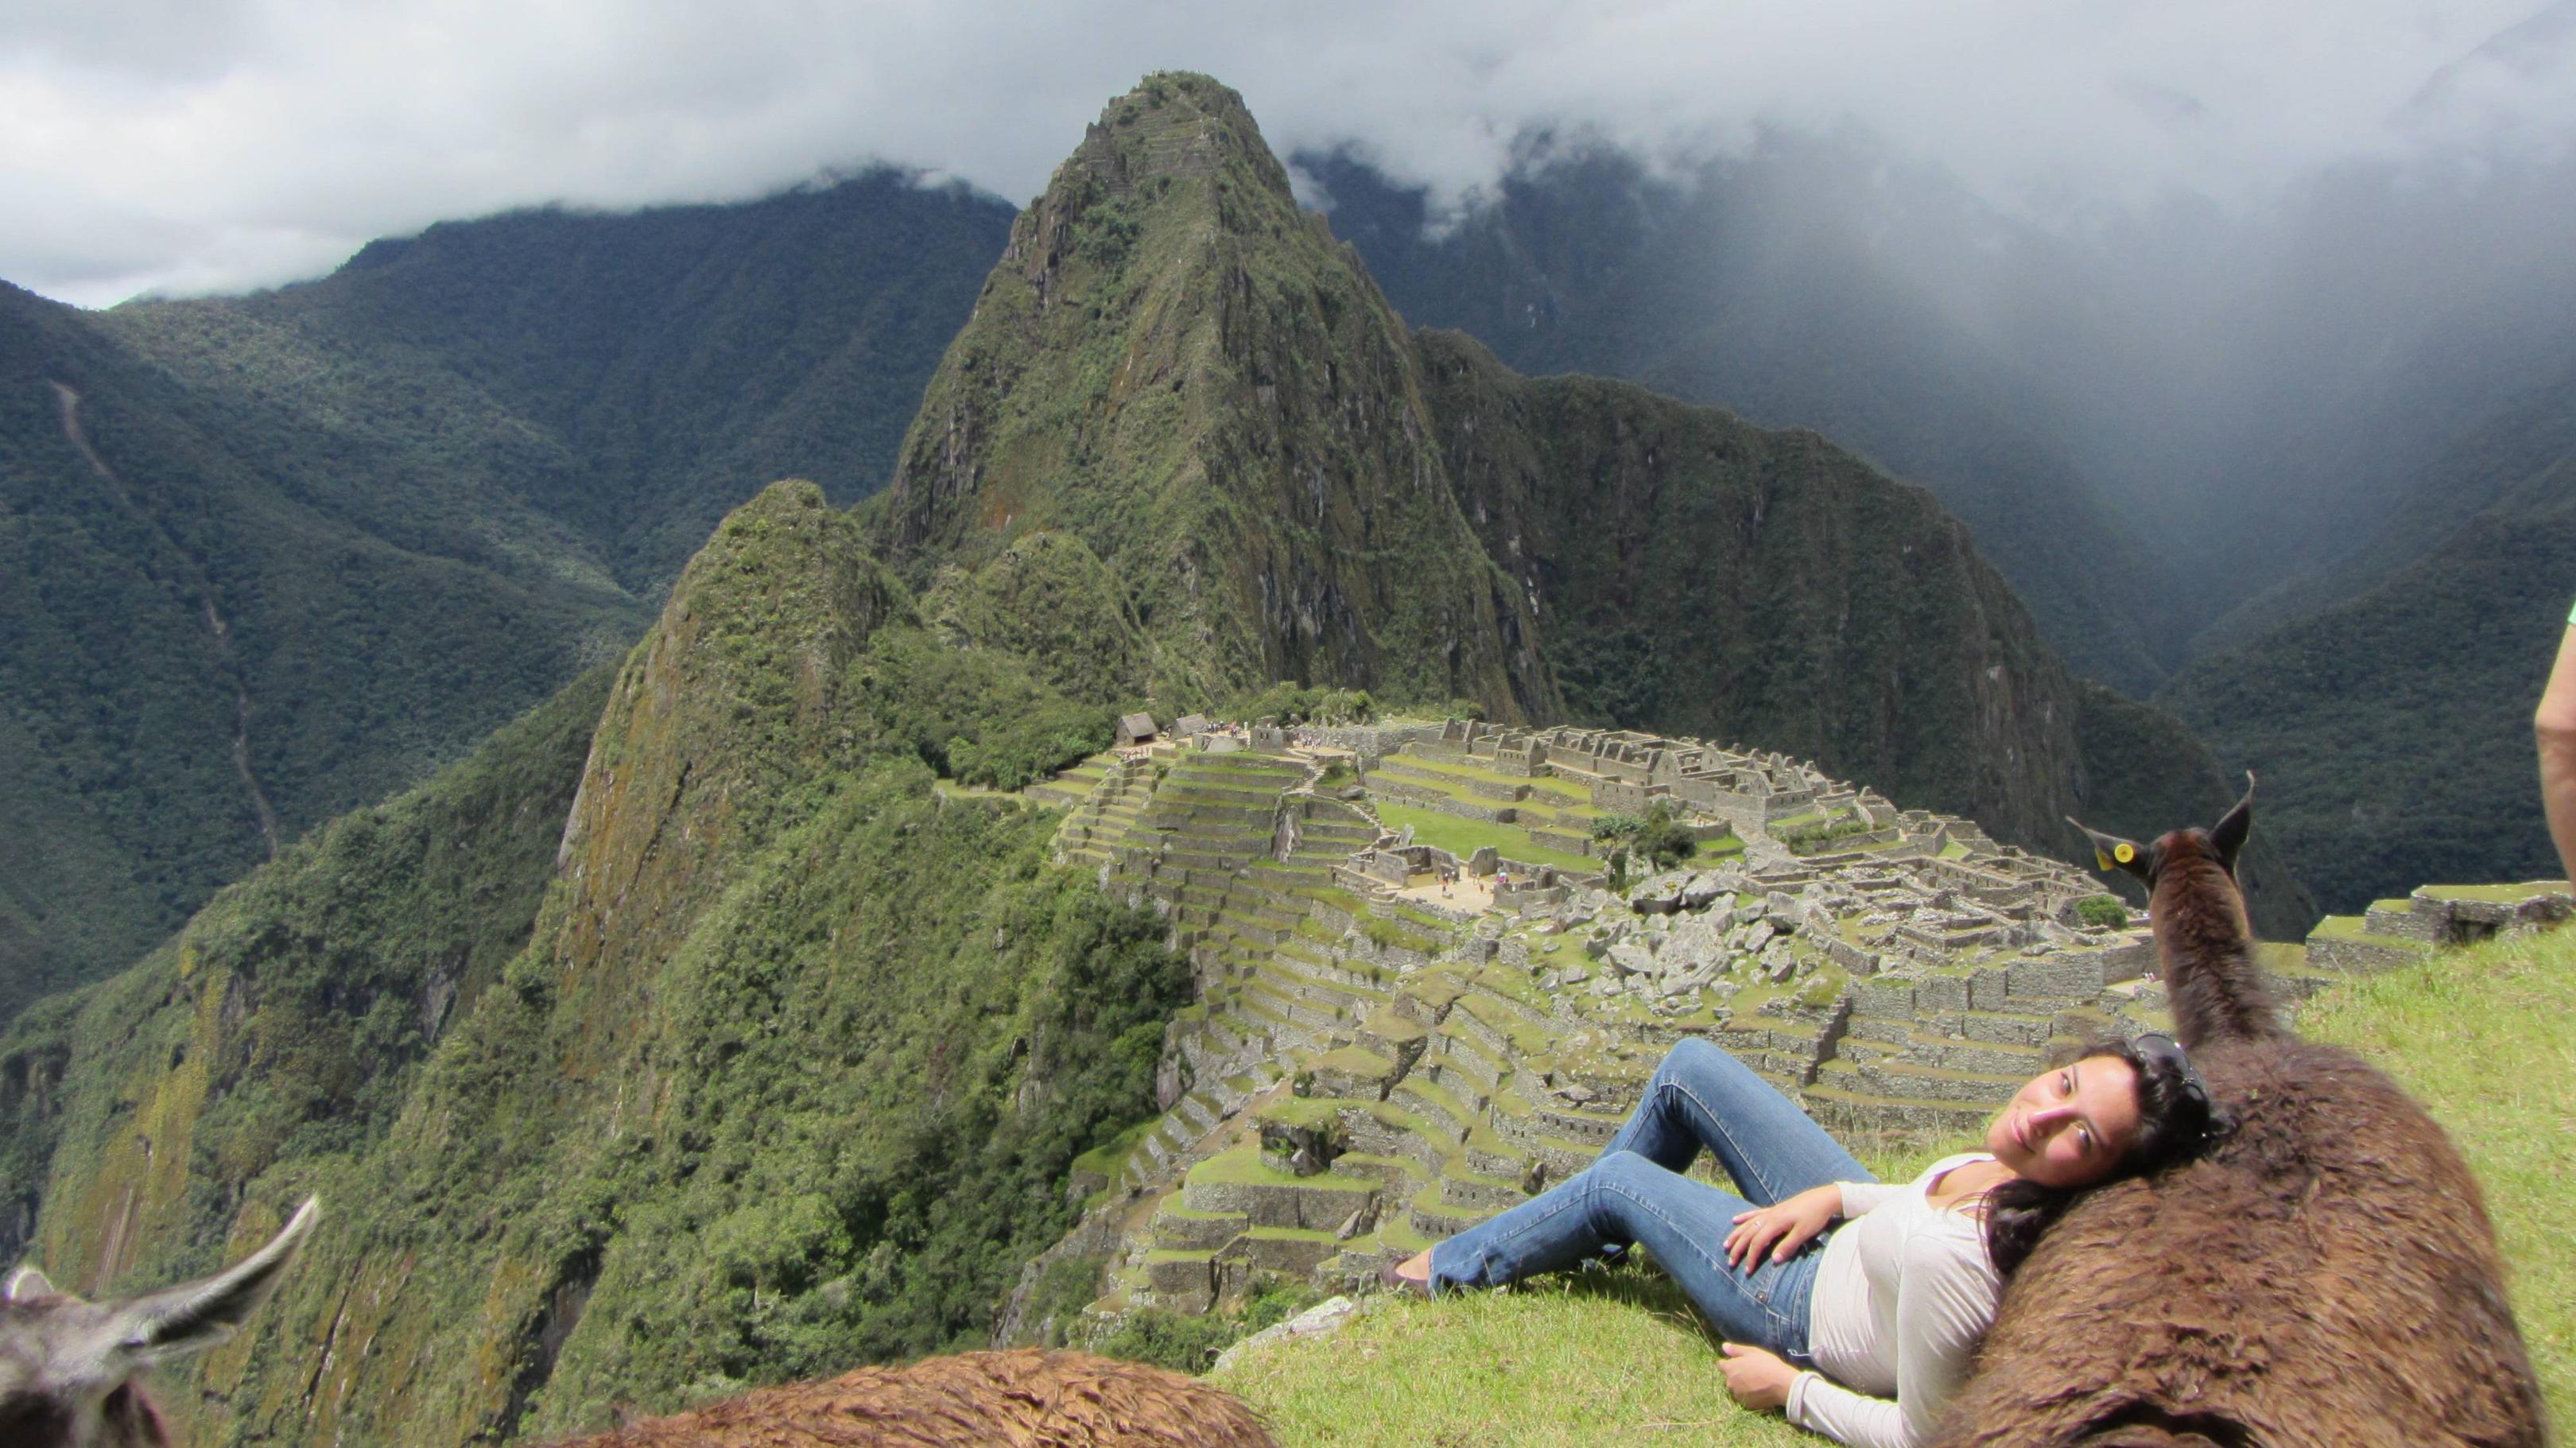 My sister resting on a llama at Machu Picchu. - Imgur